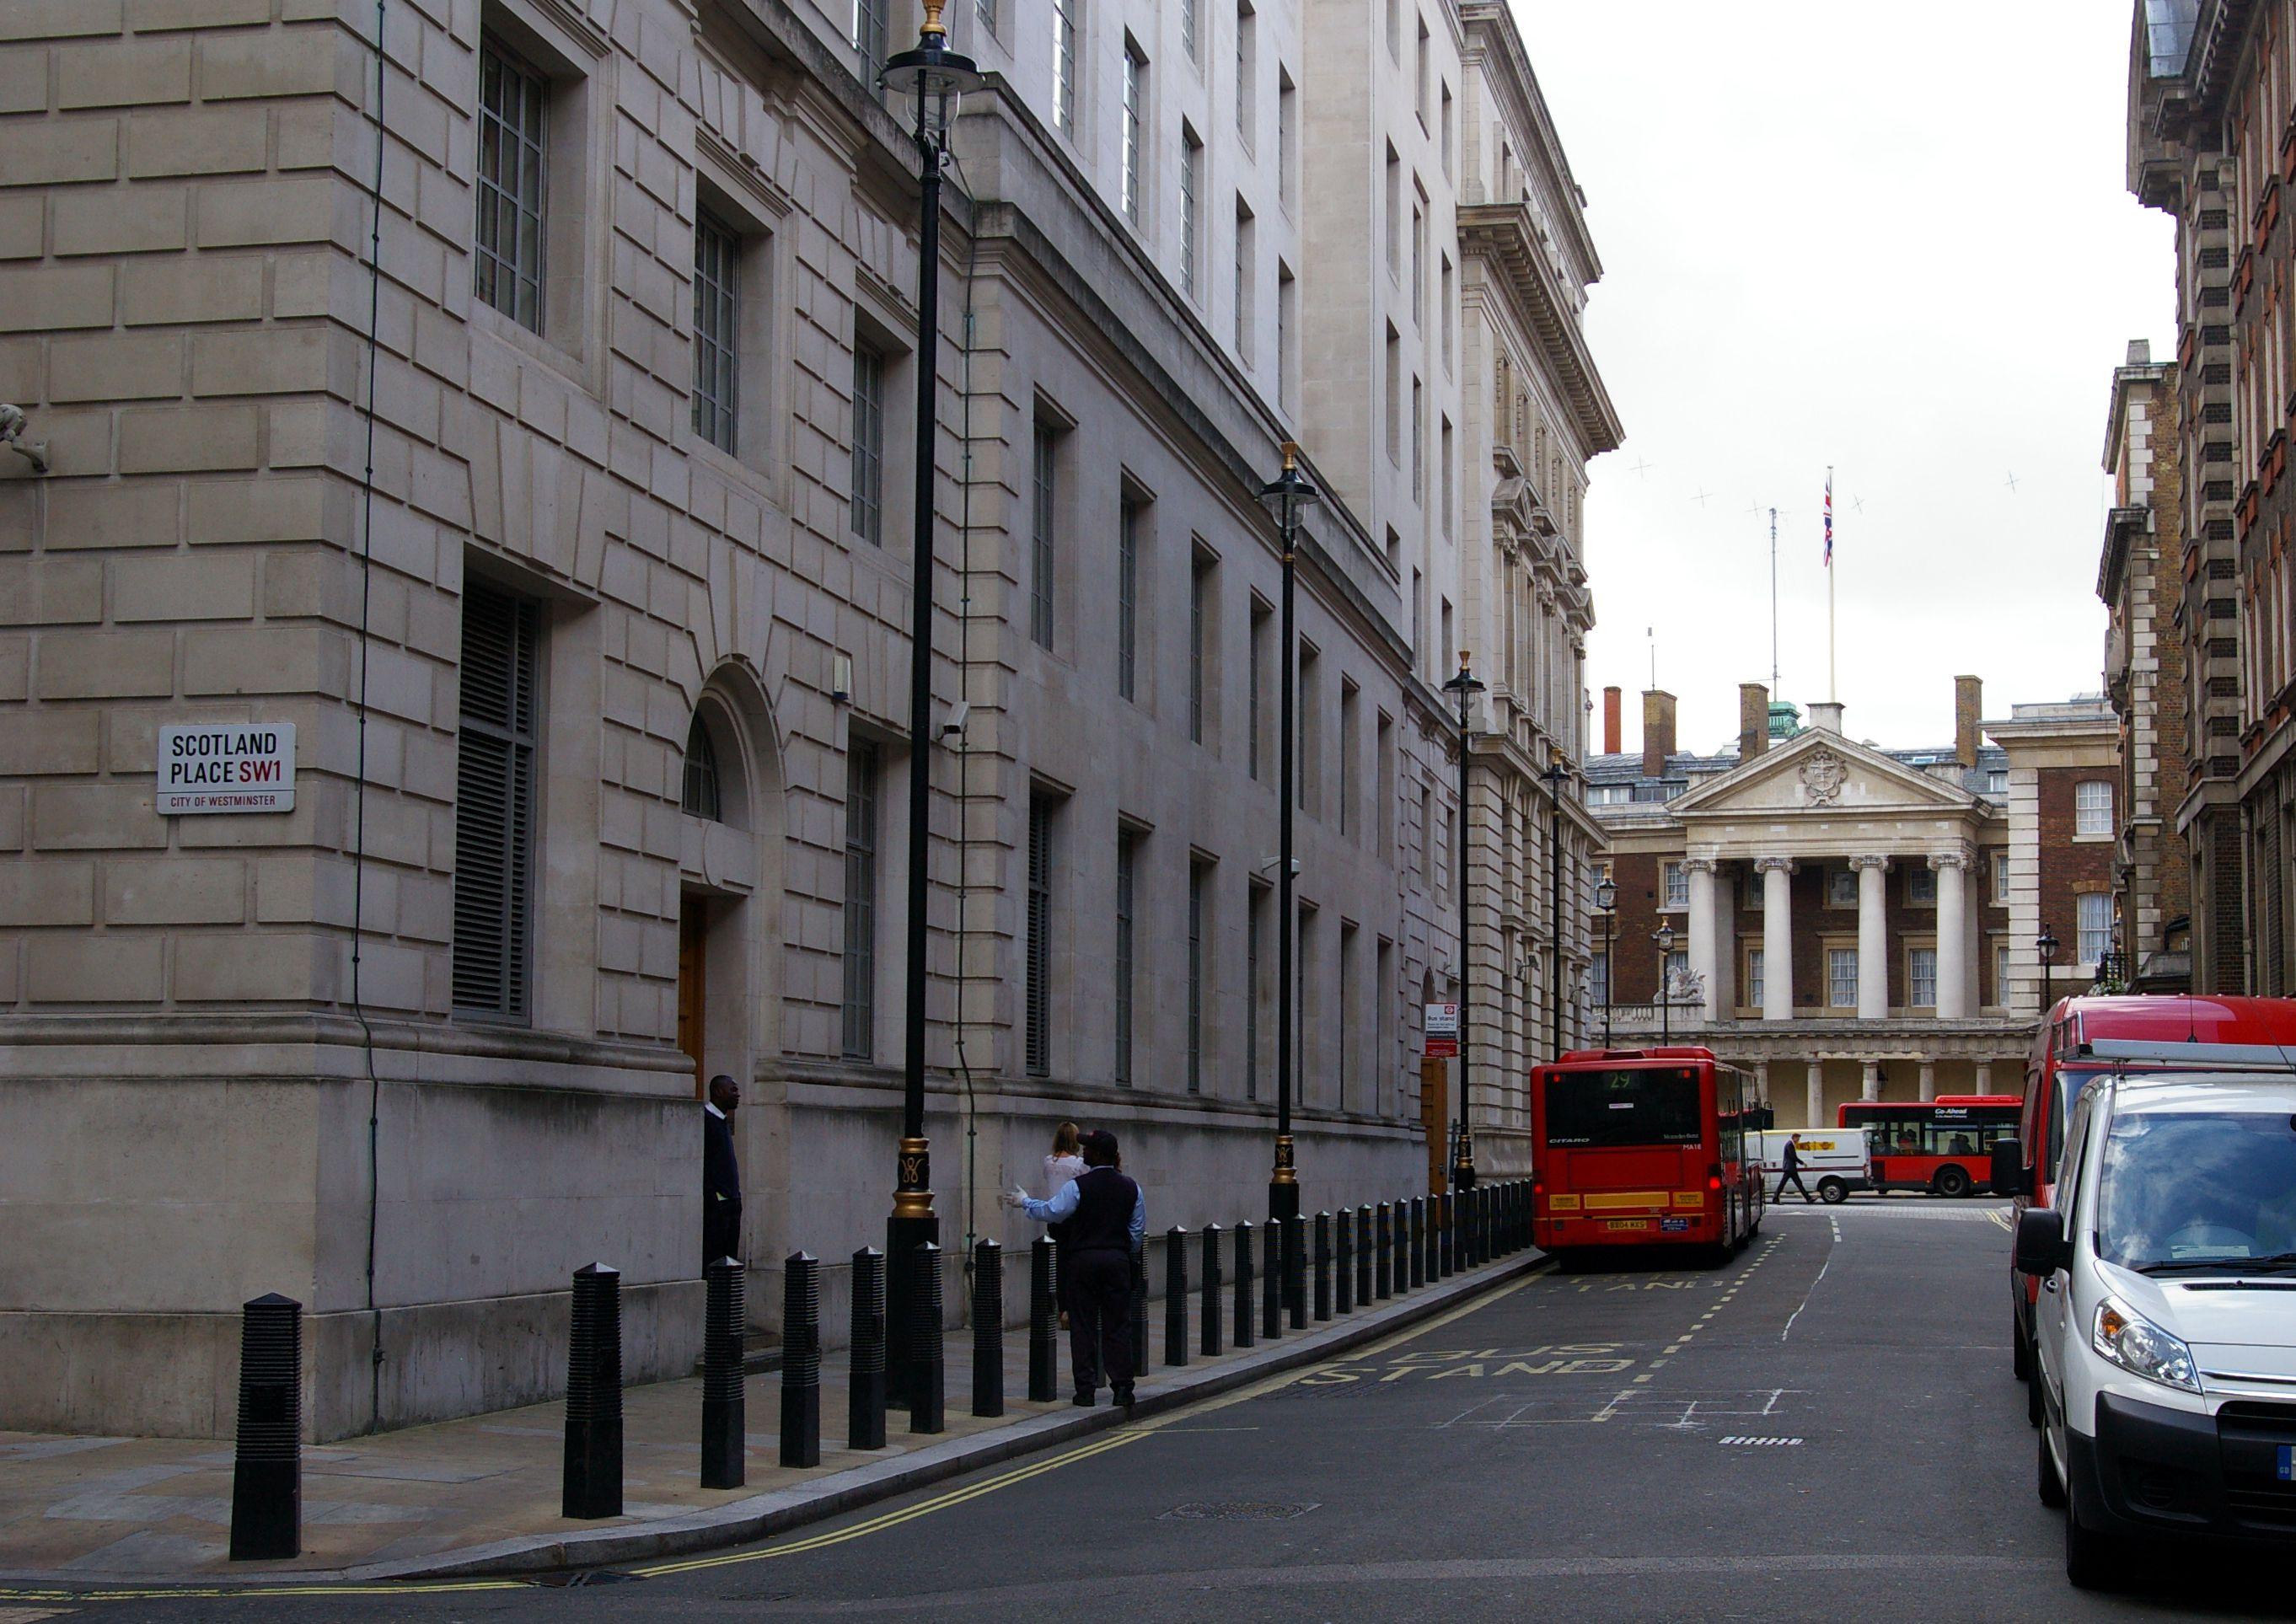 Ministry of Magic entrance, Great Scotland Yard, London